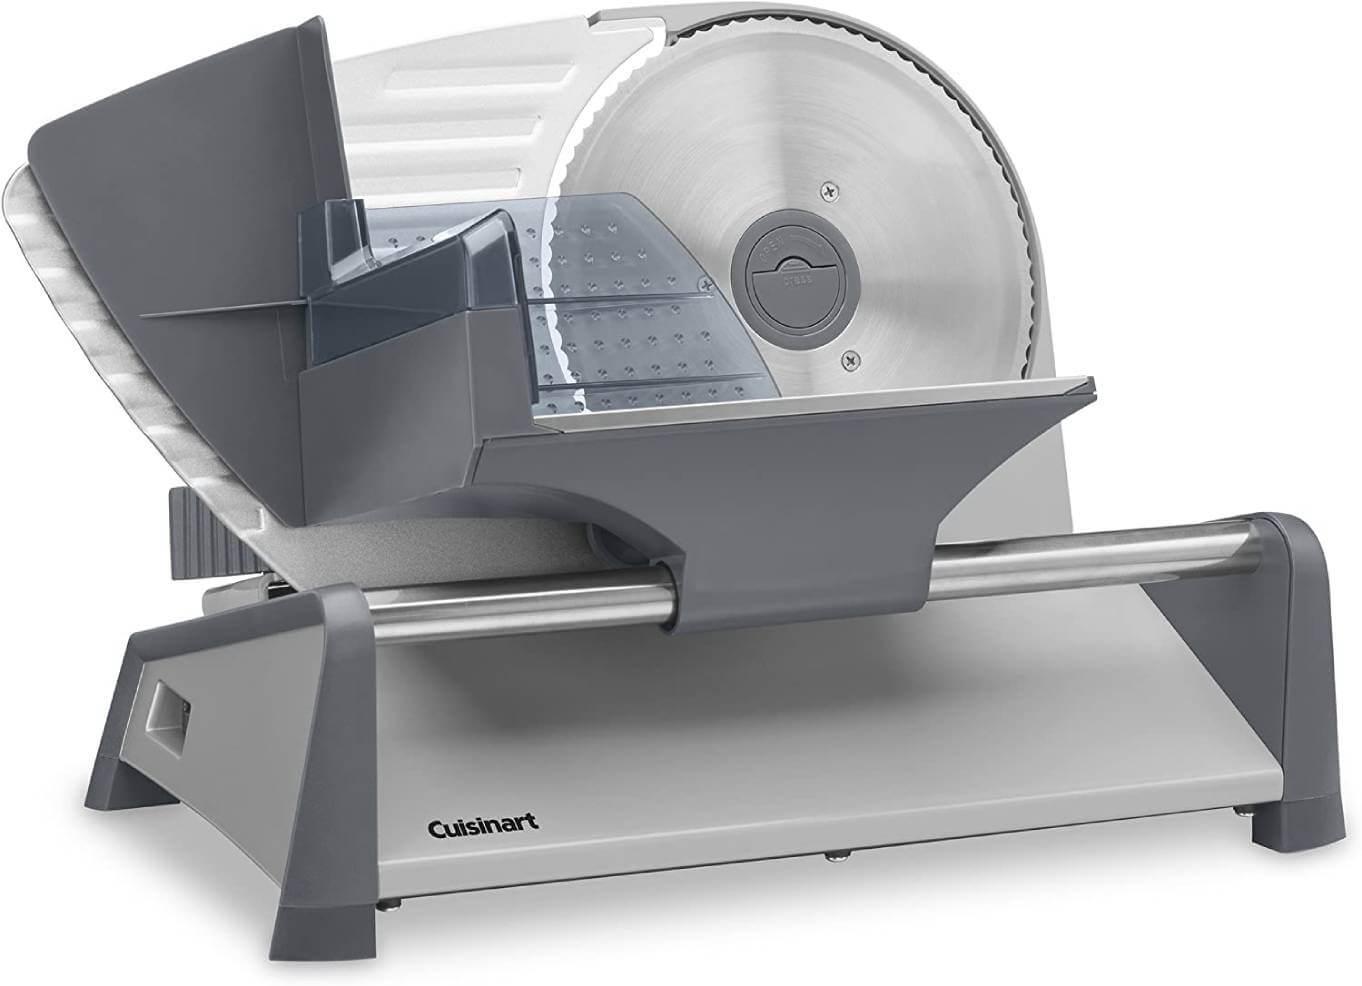 Cuisinart Kitchen Pro Food Slicer